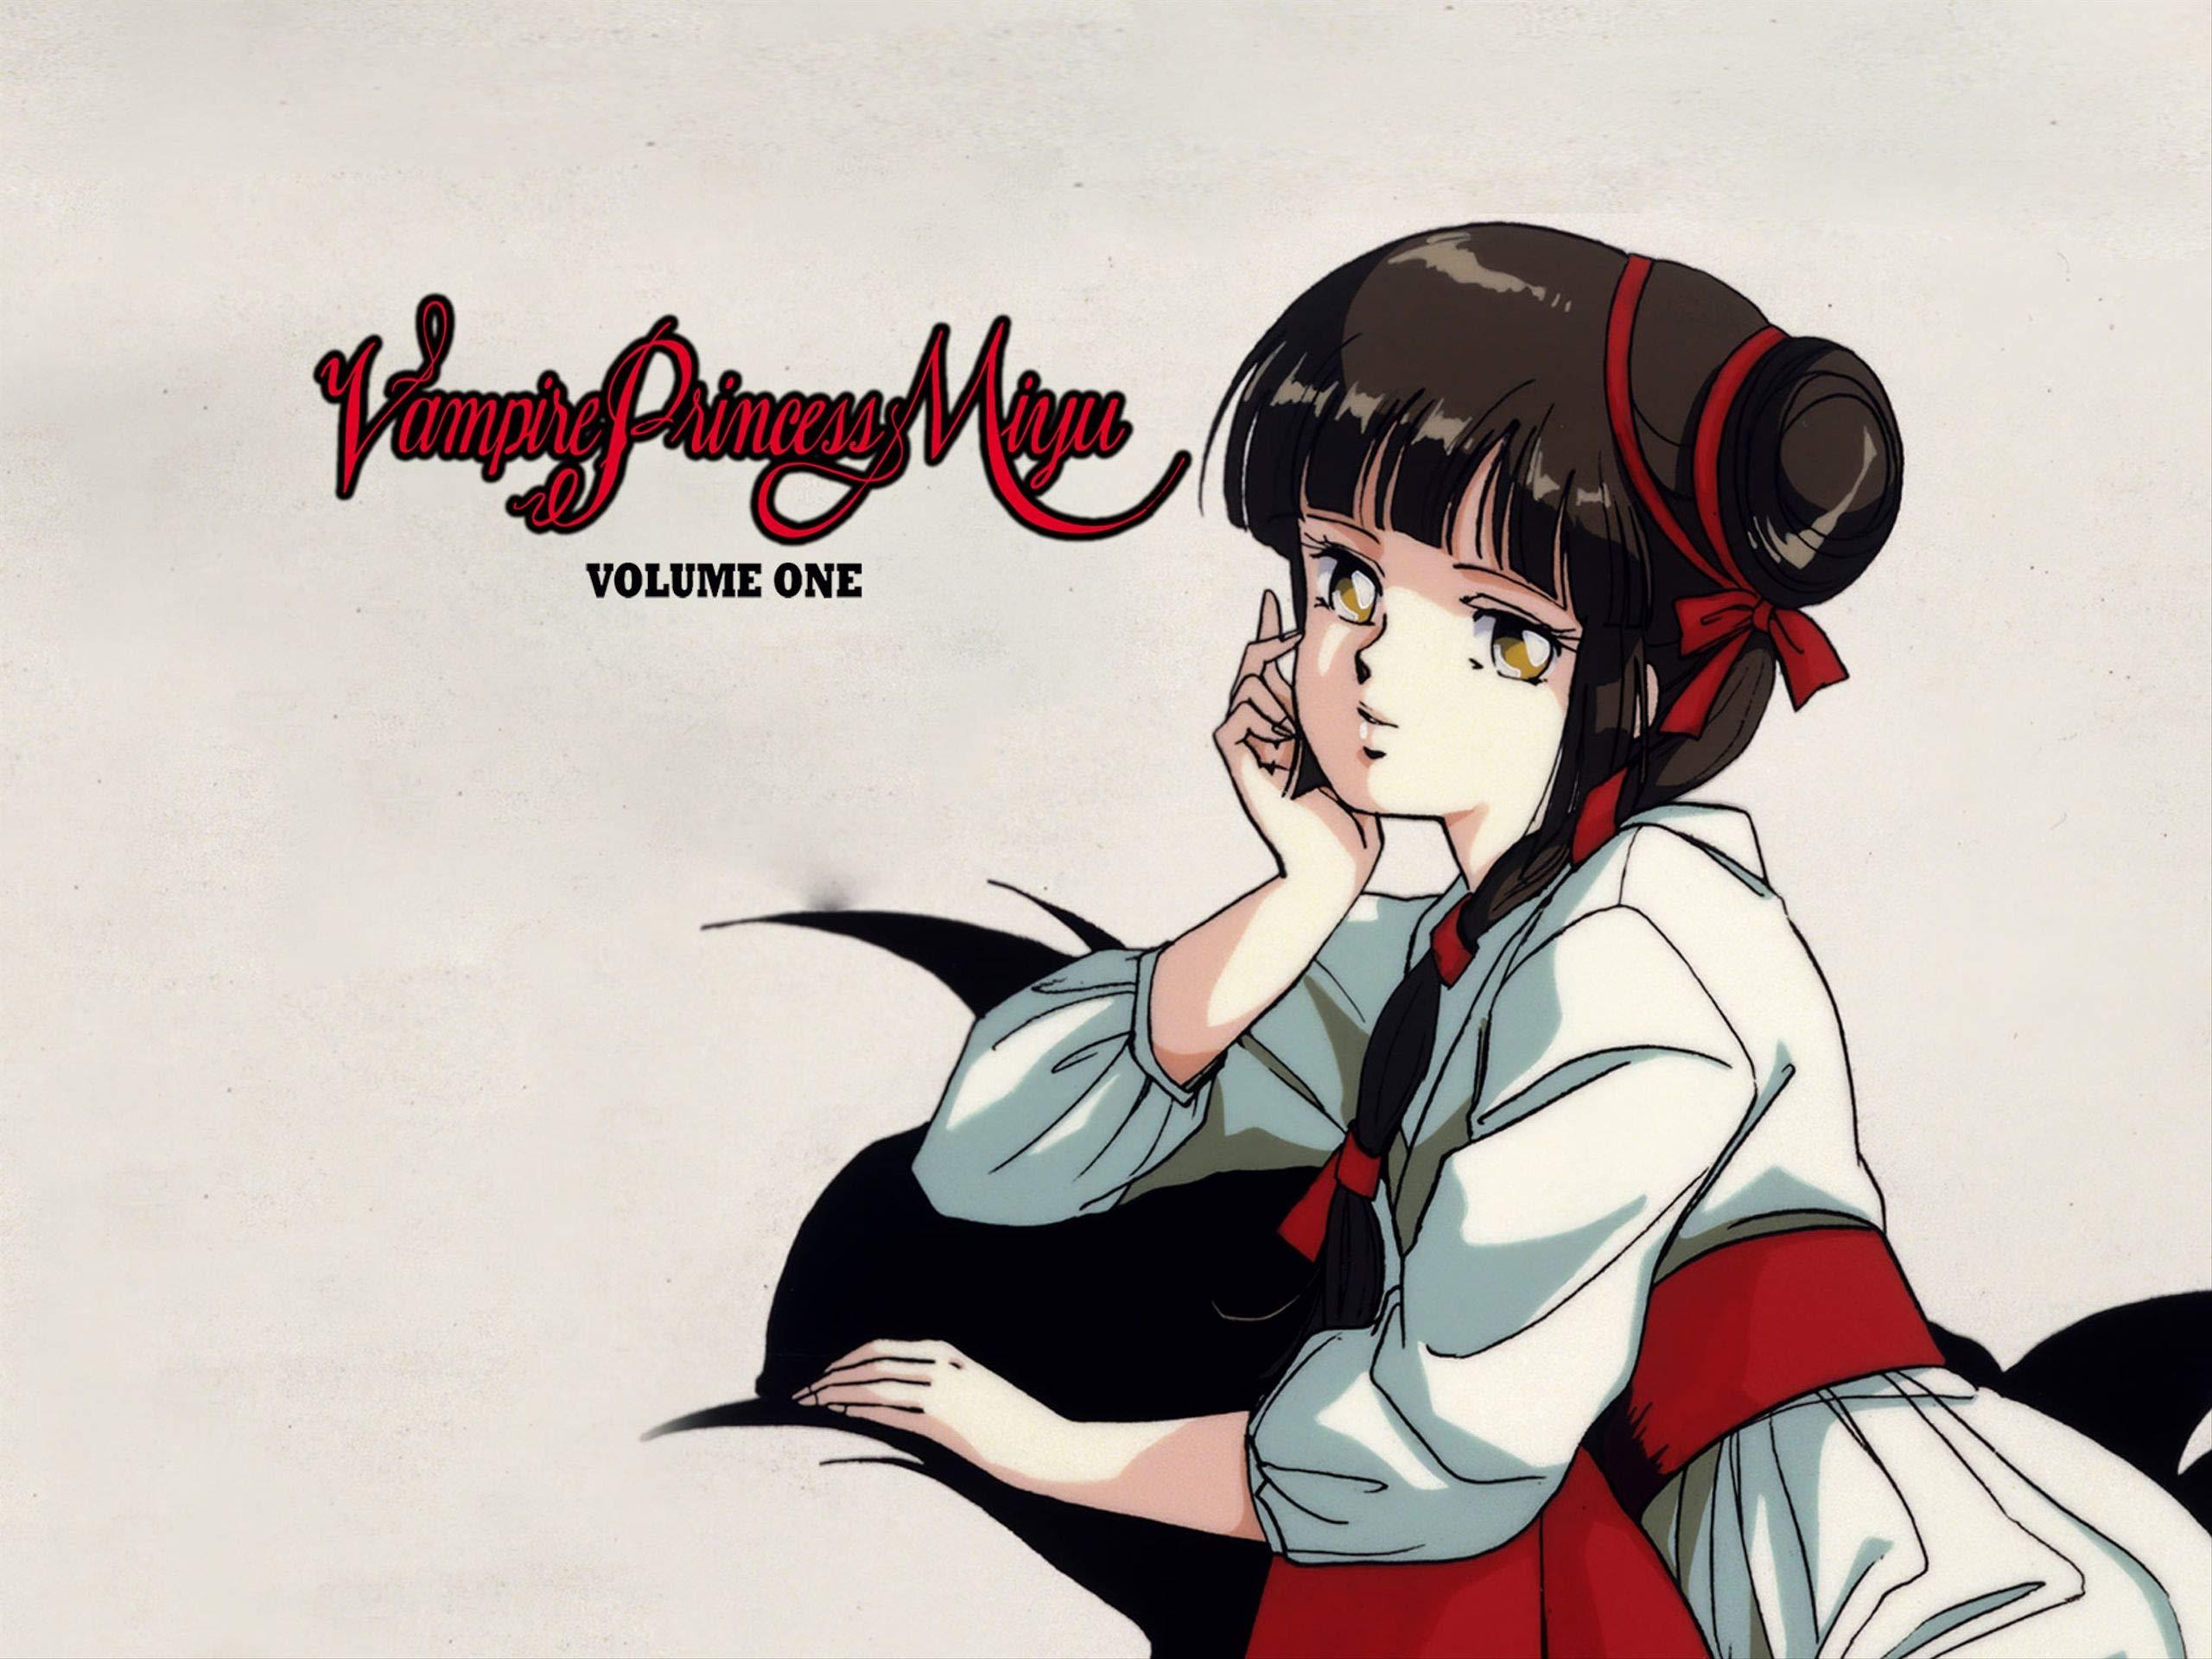 Vampire Princess Miyu - Best Vampire Anime of All Time